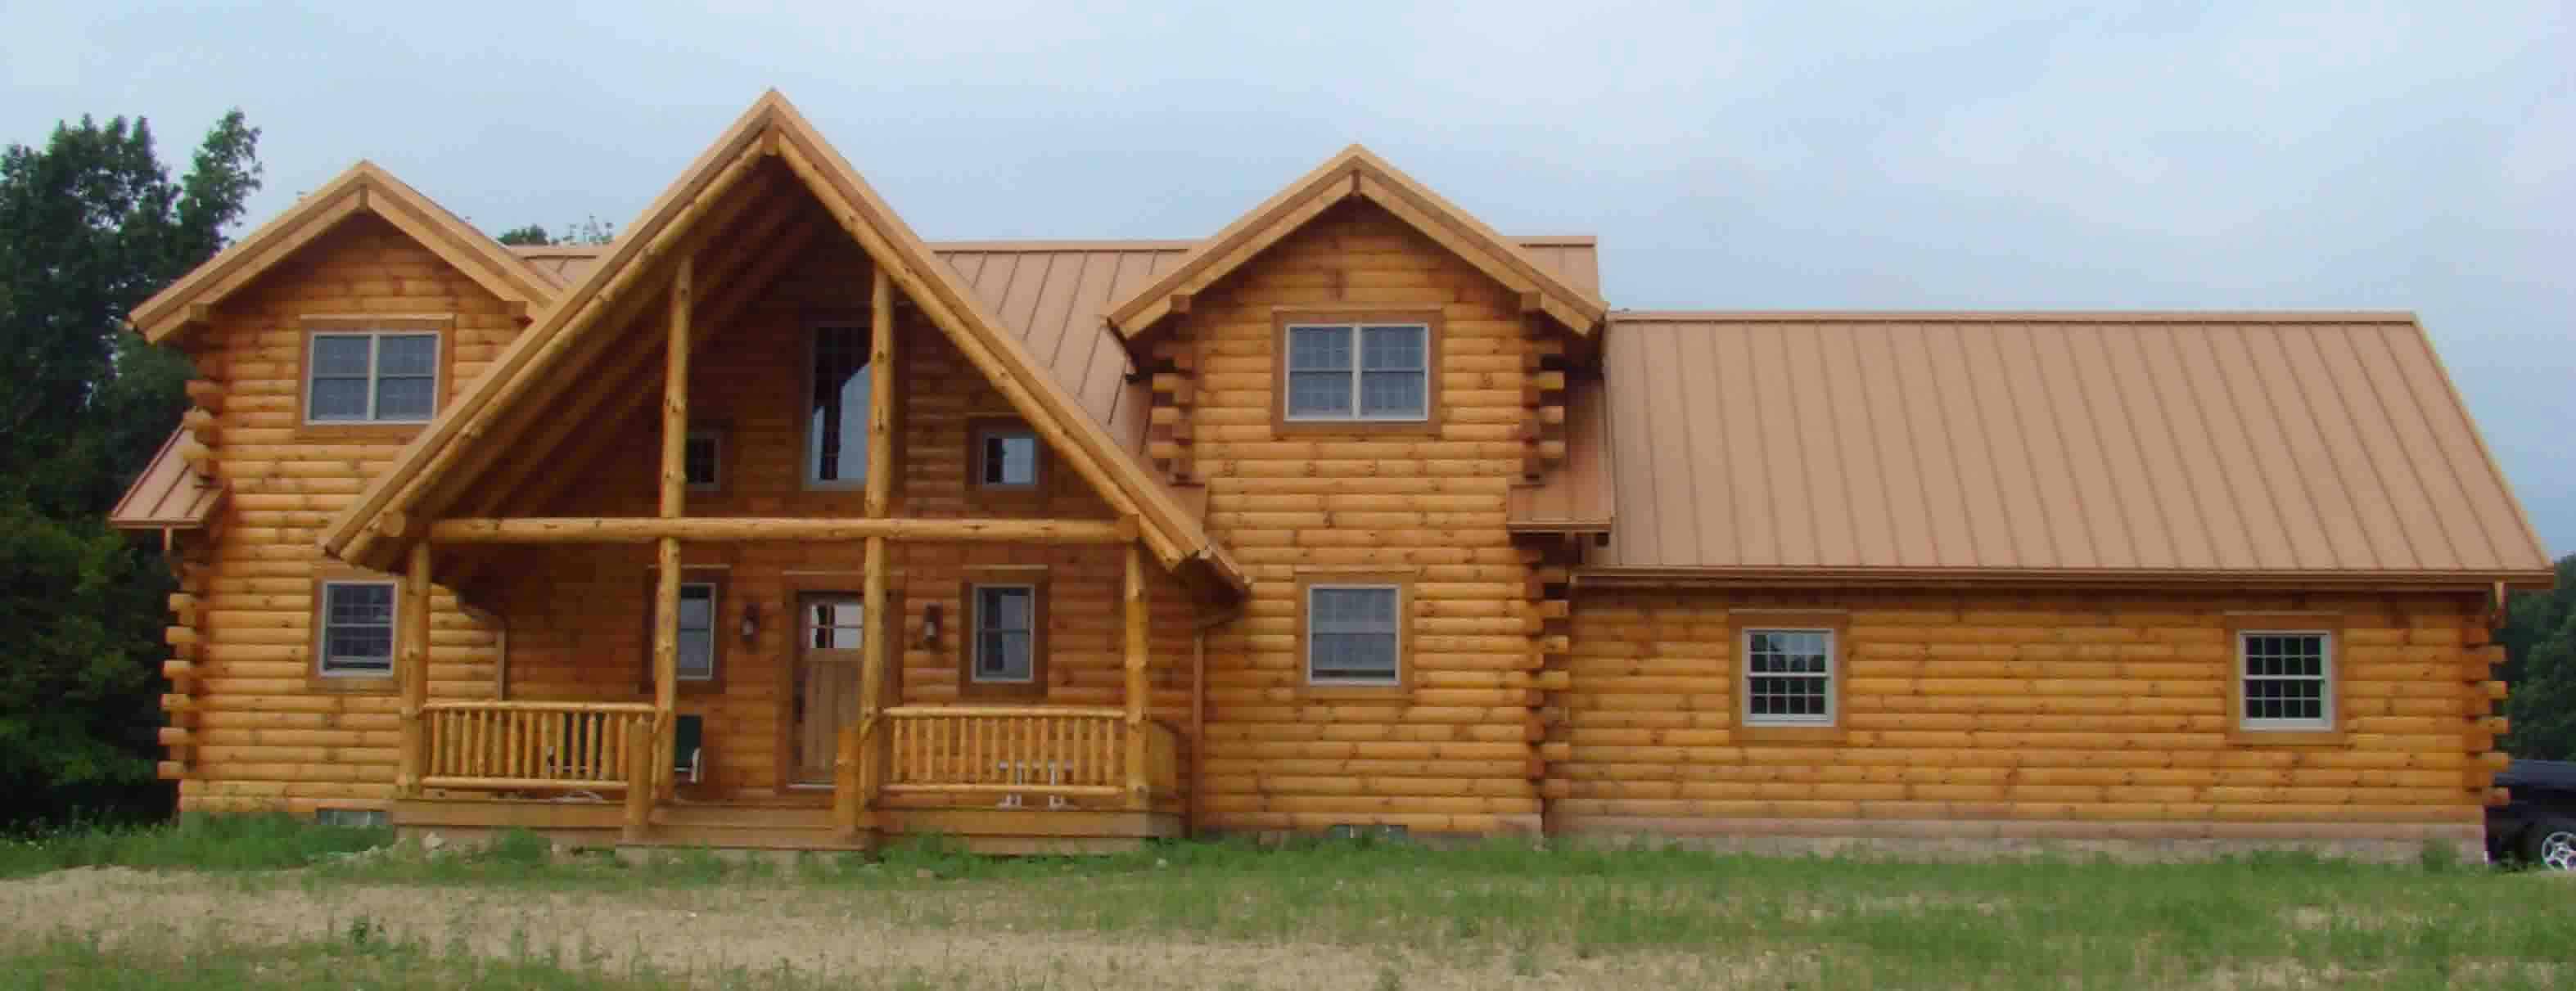 Capron Construction Company Log Home Steel Roof